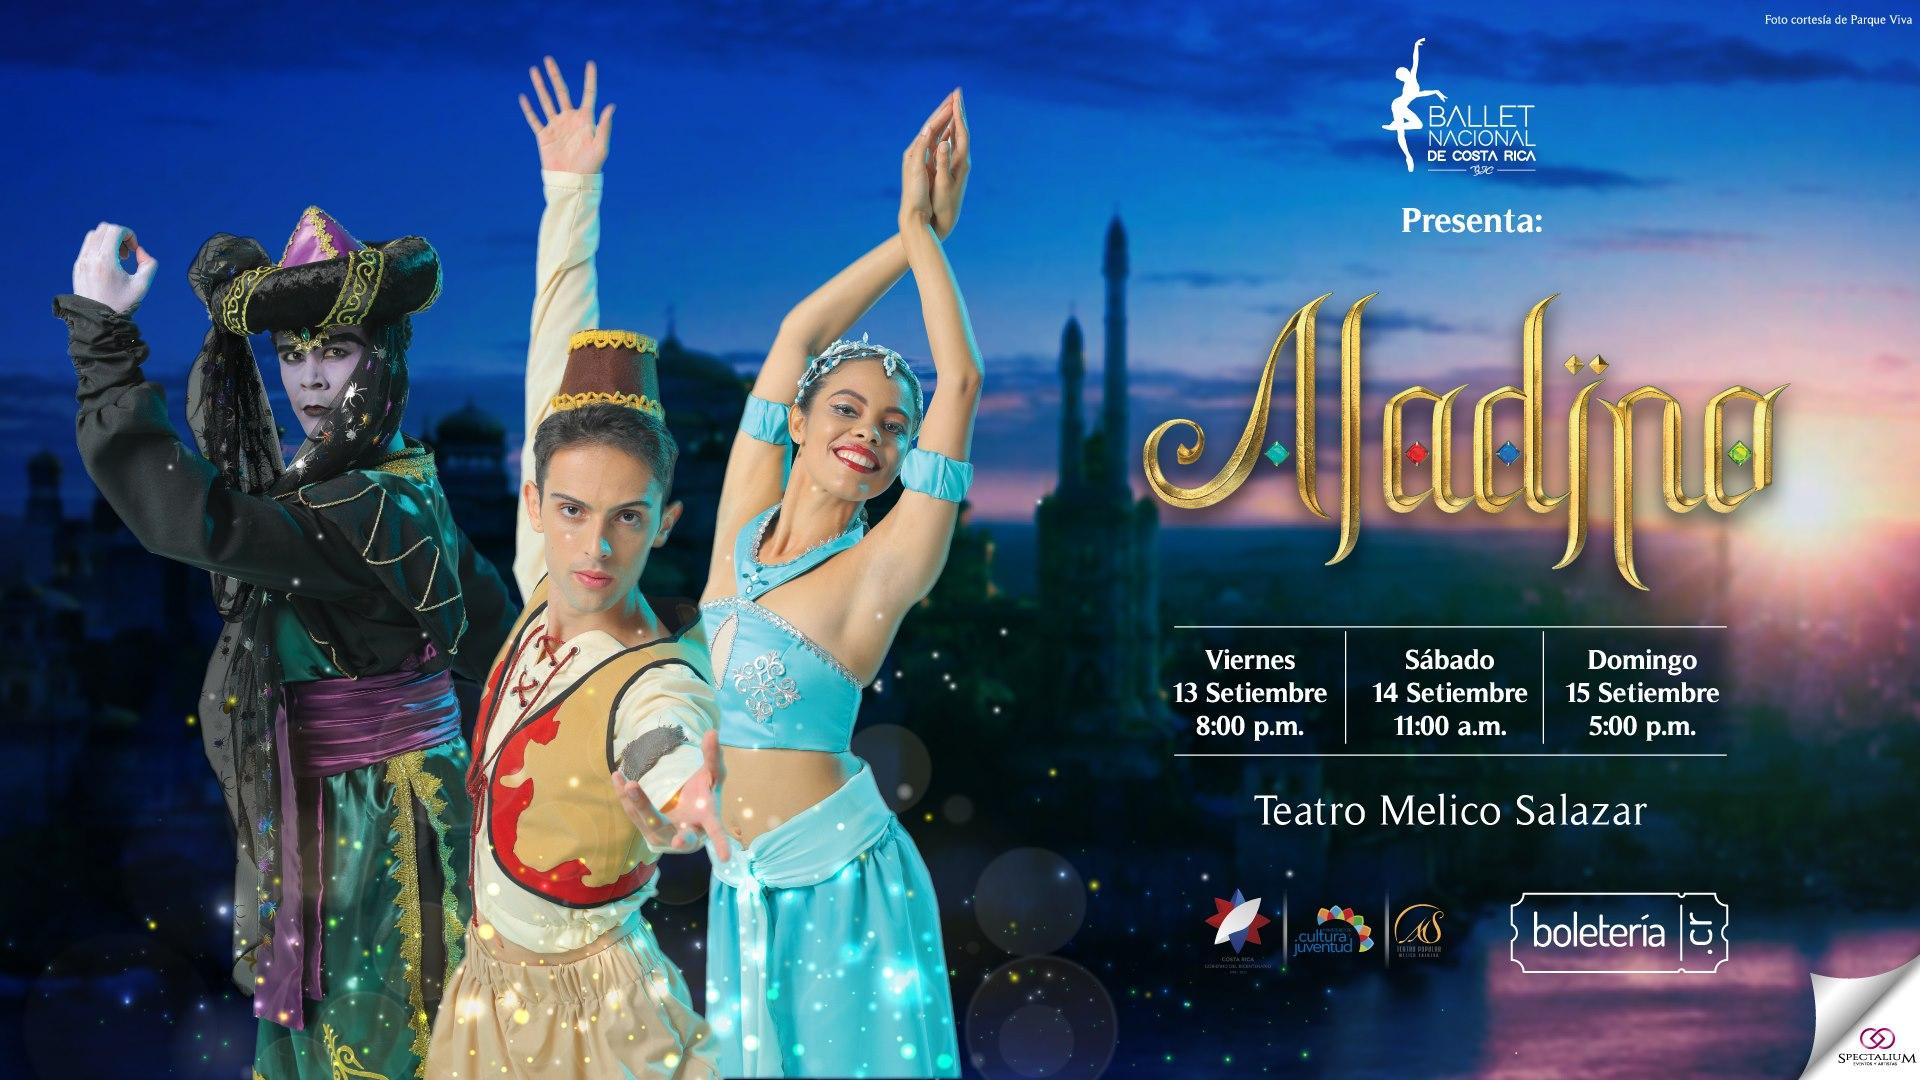 https://teatromelico.go.cr/images/AlladinoPortada.jpg